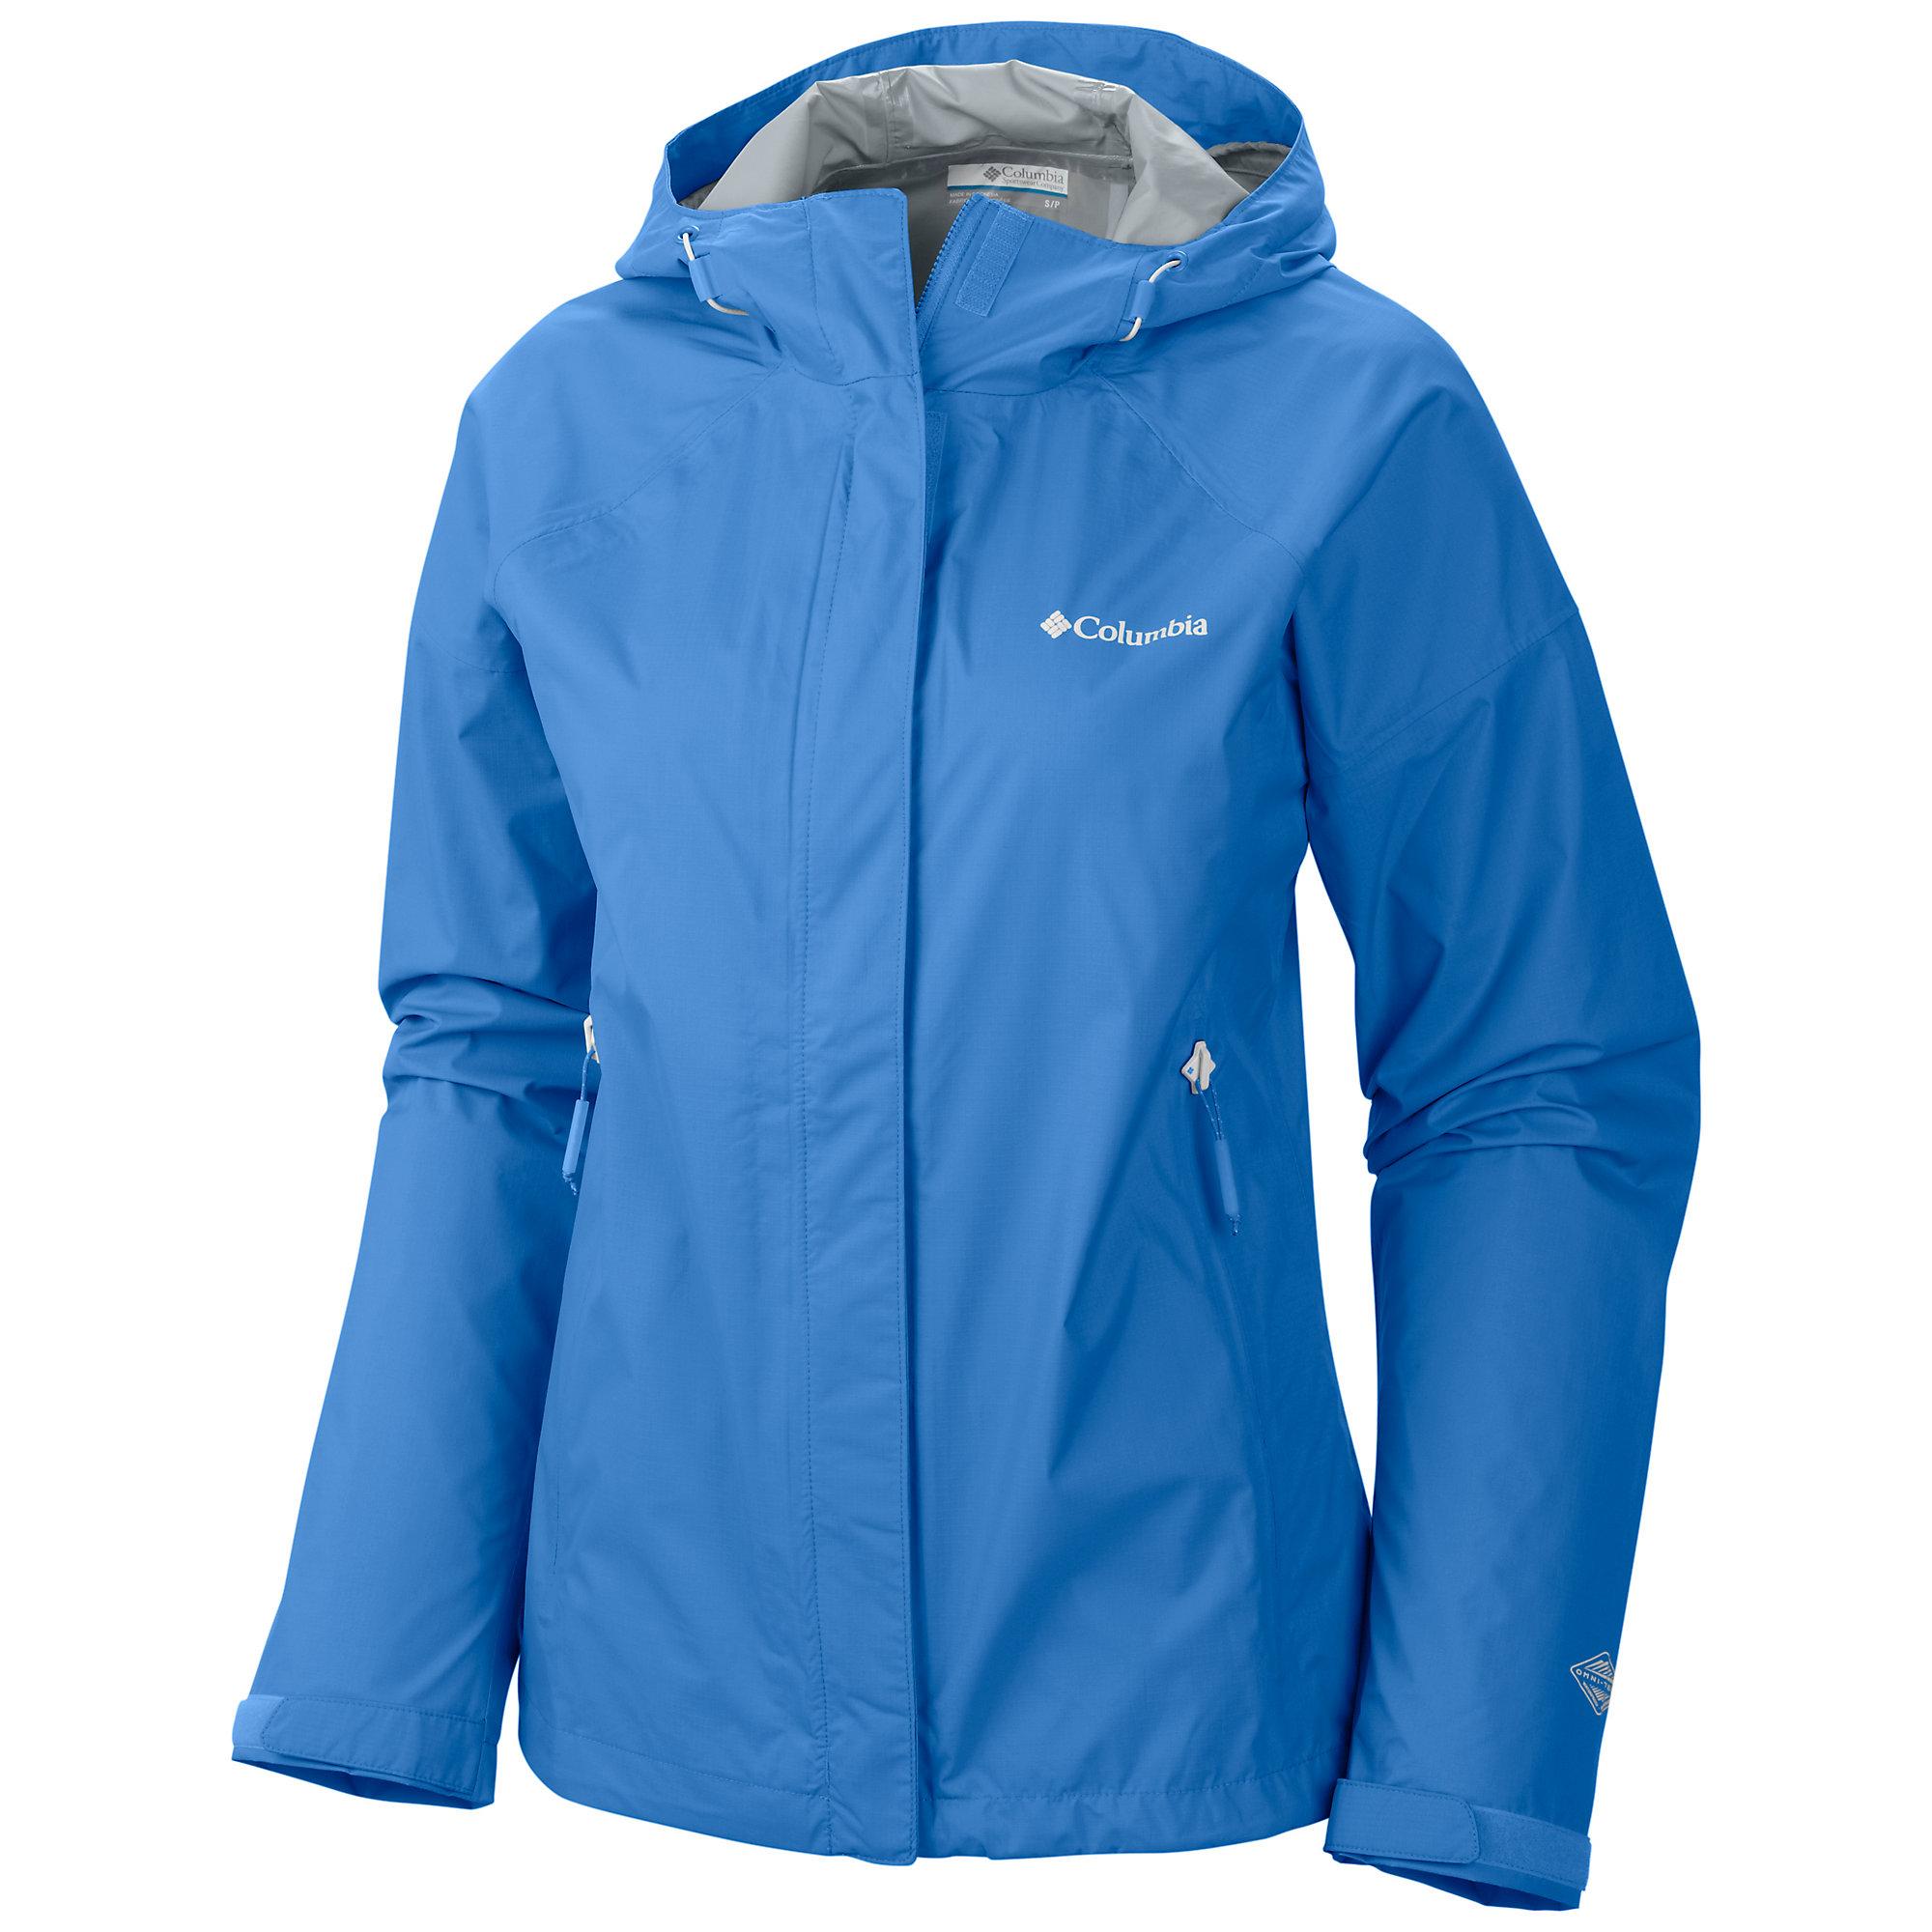 Columbia Sleeker Rain Jacket